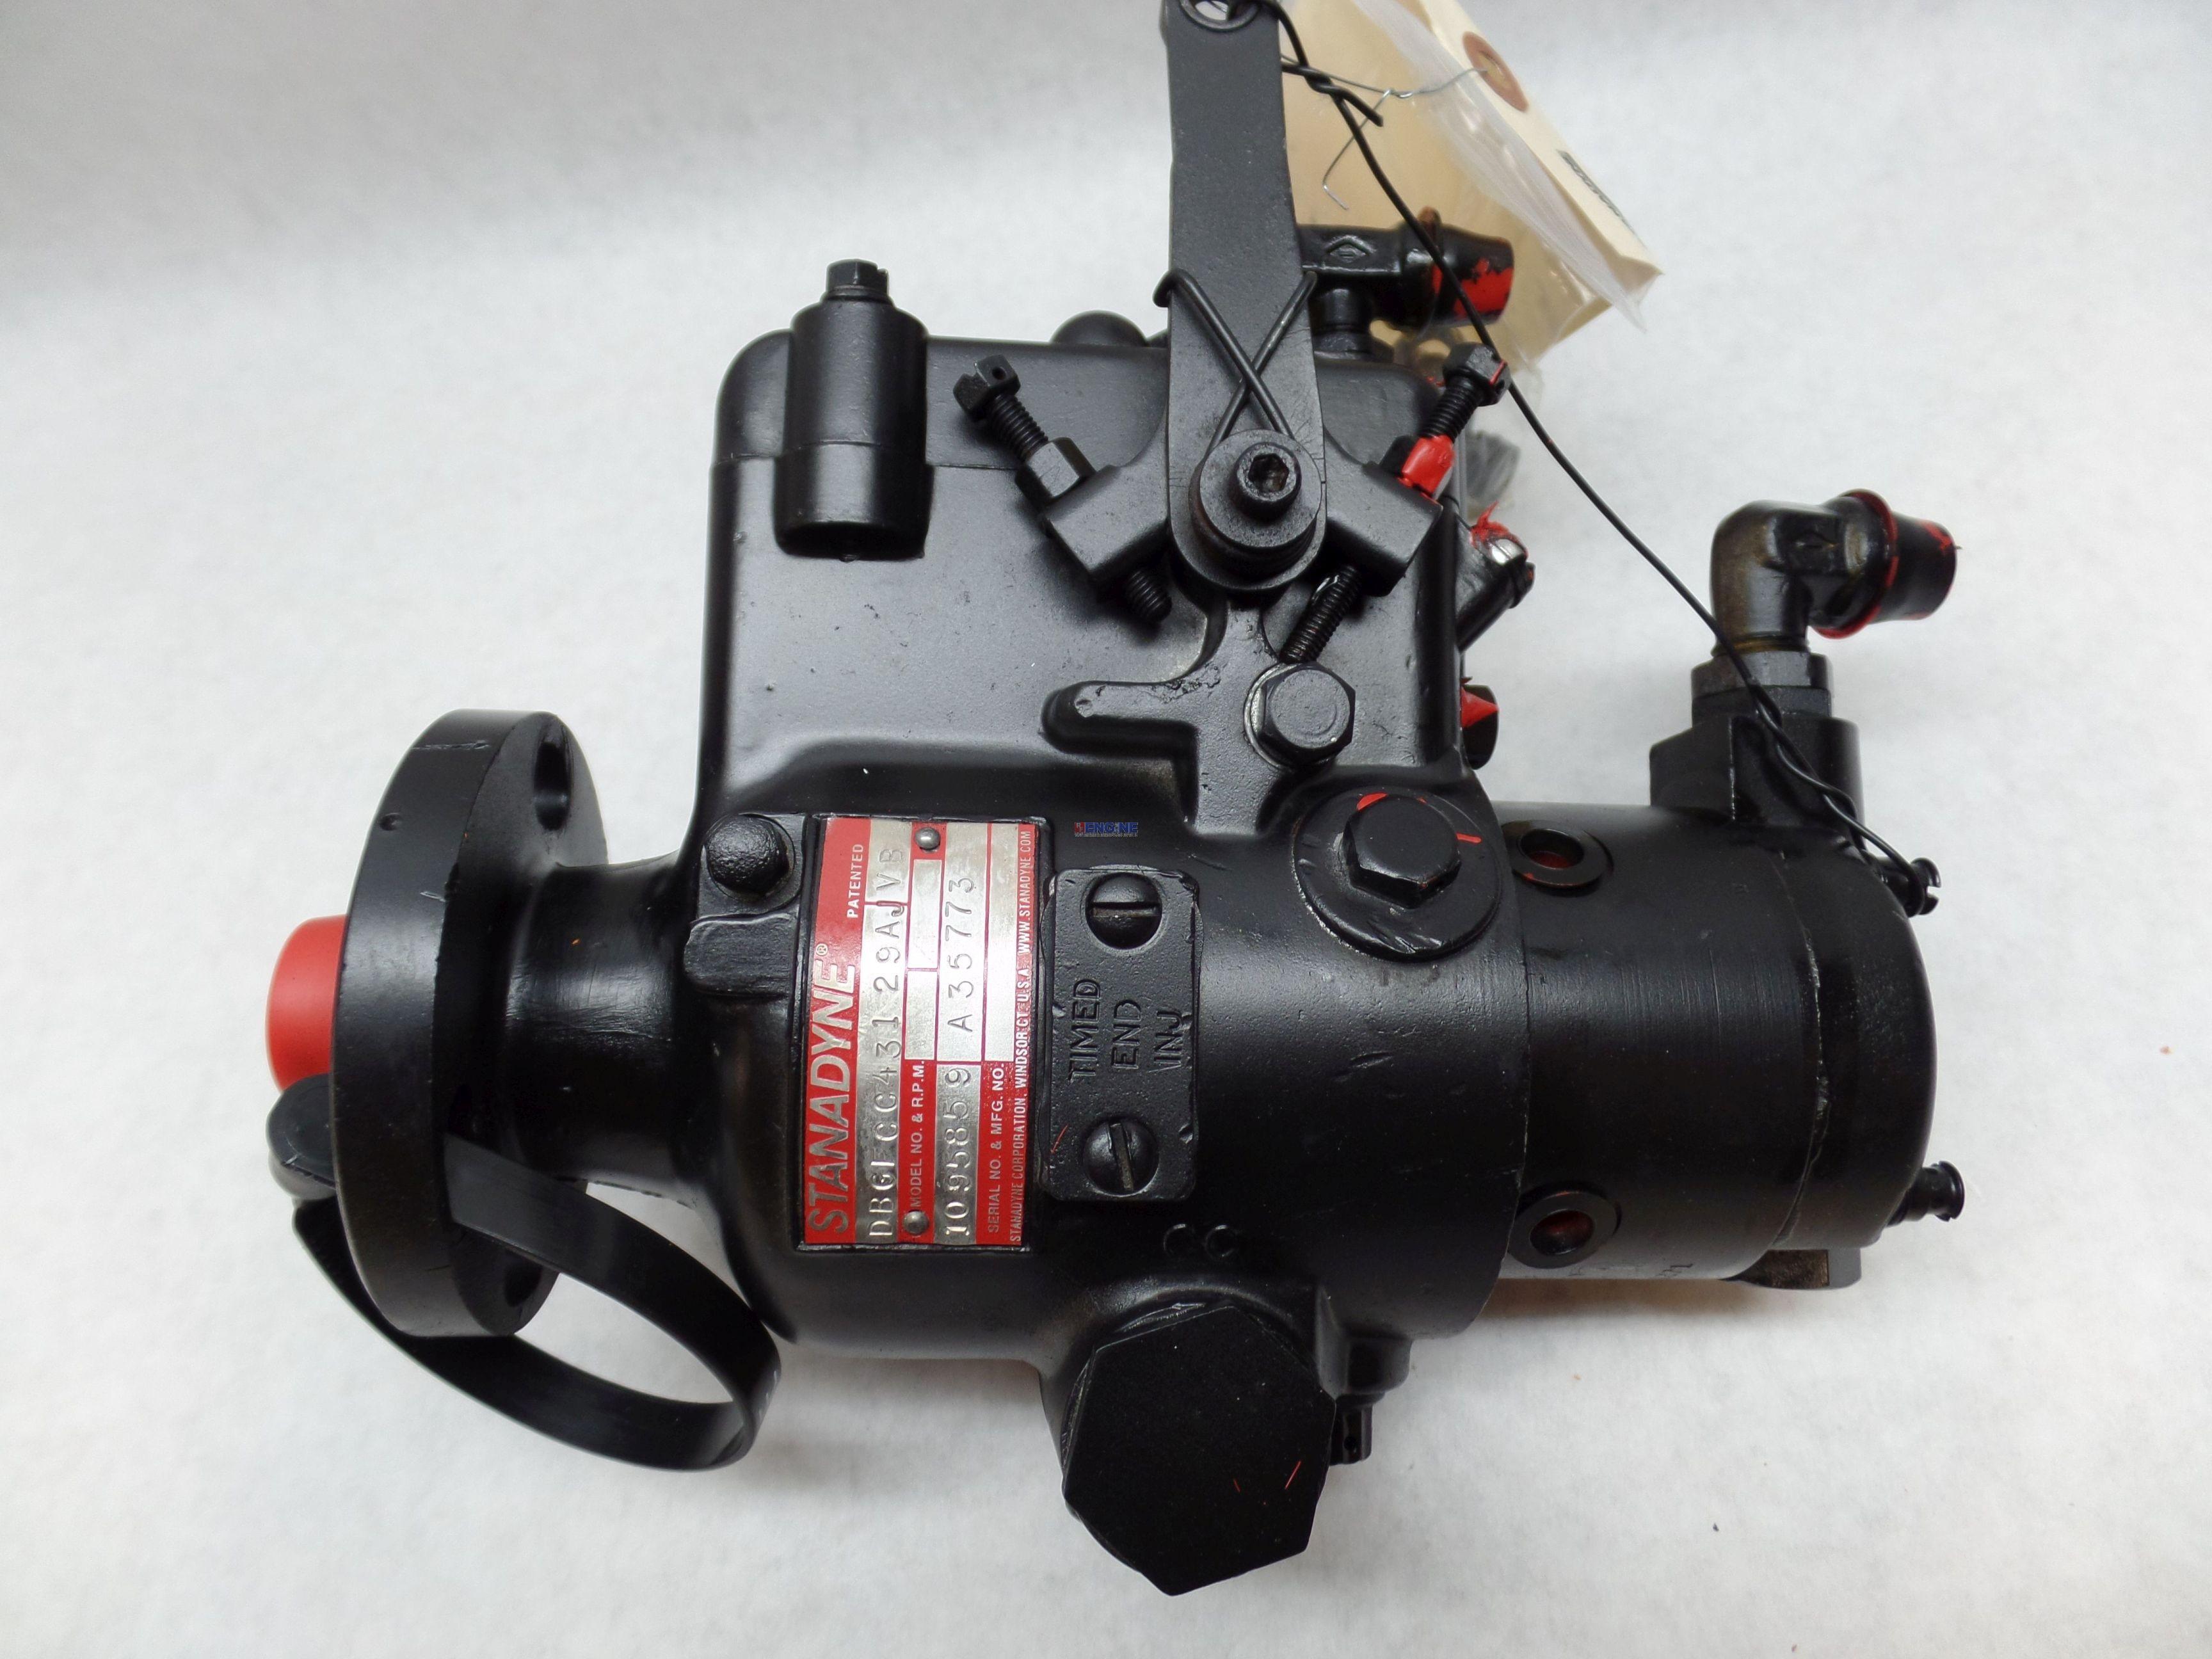 Case Cs 188d Injector Pump Rebuilt Dbgfcc431 29aj Vb